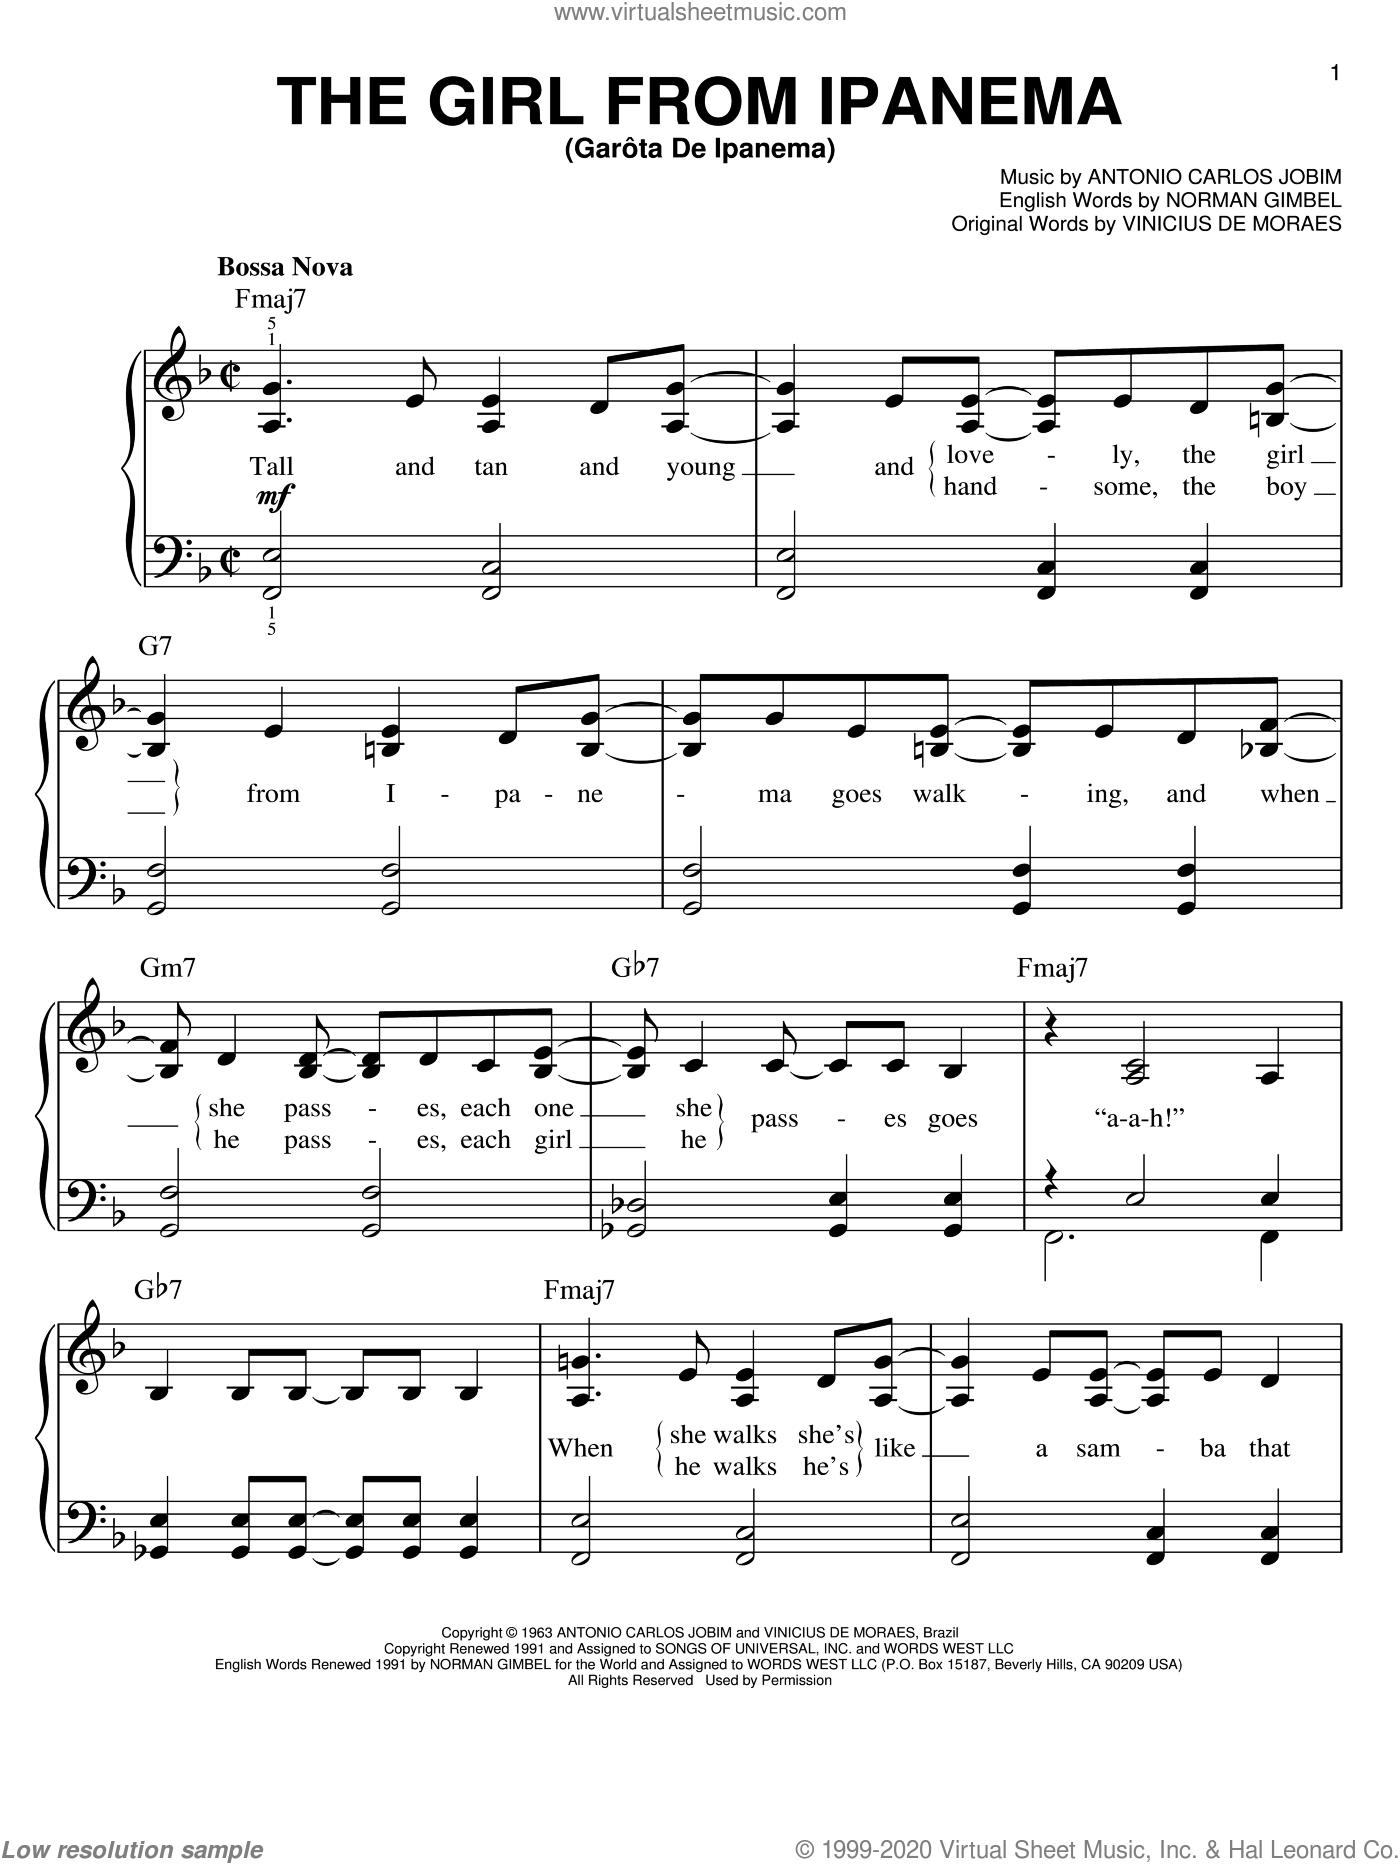 The Girl From Ipanema (GarA'ta De Ipanema) sheet music for piano solo by Antonio Carlos Jobim, easy skill level